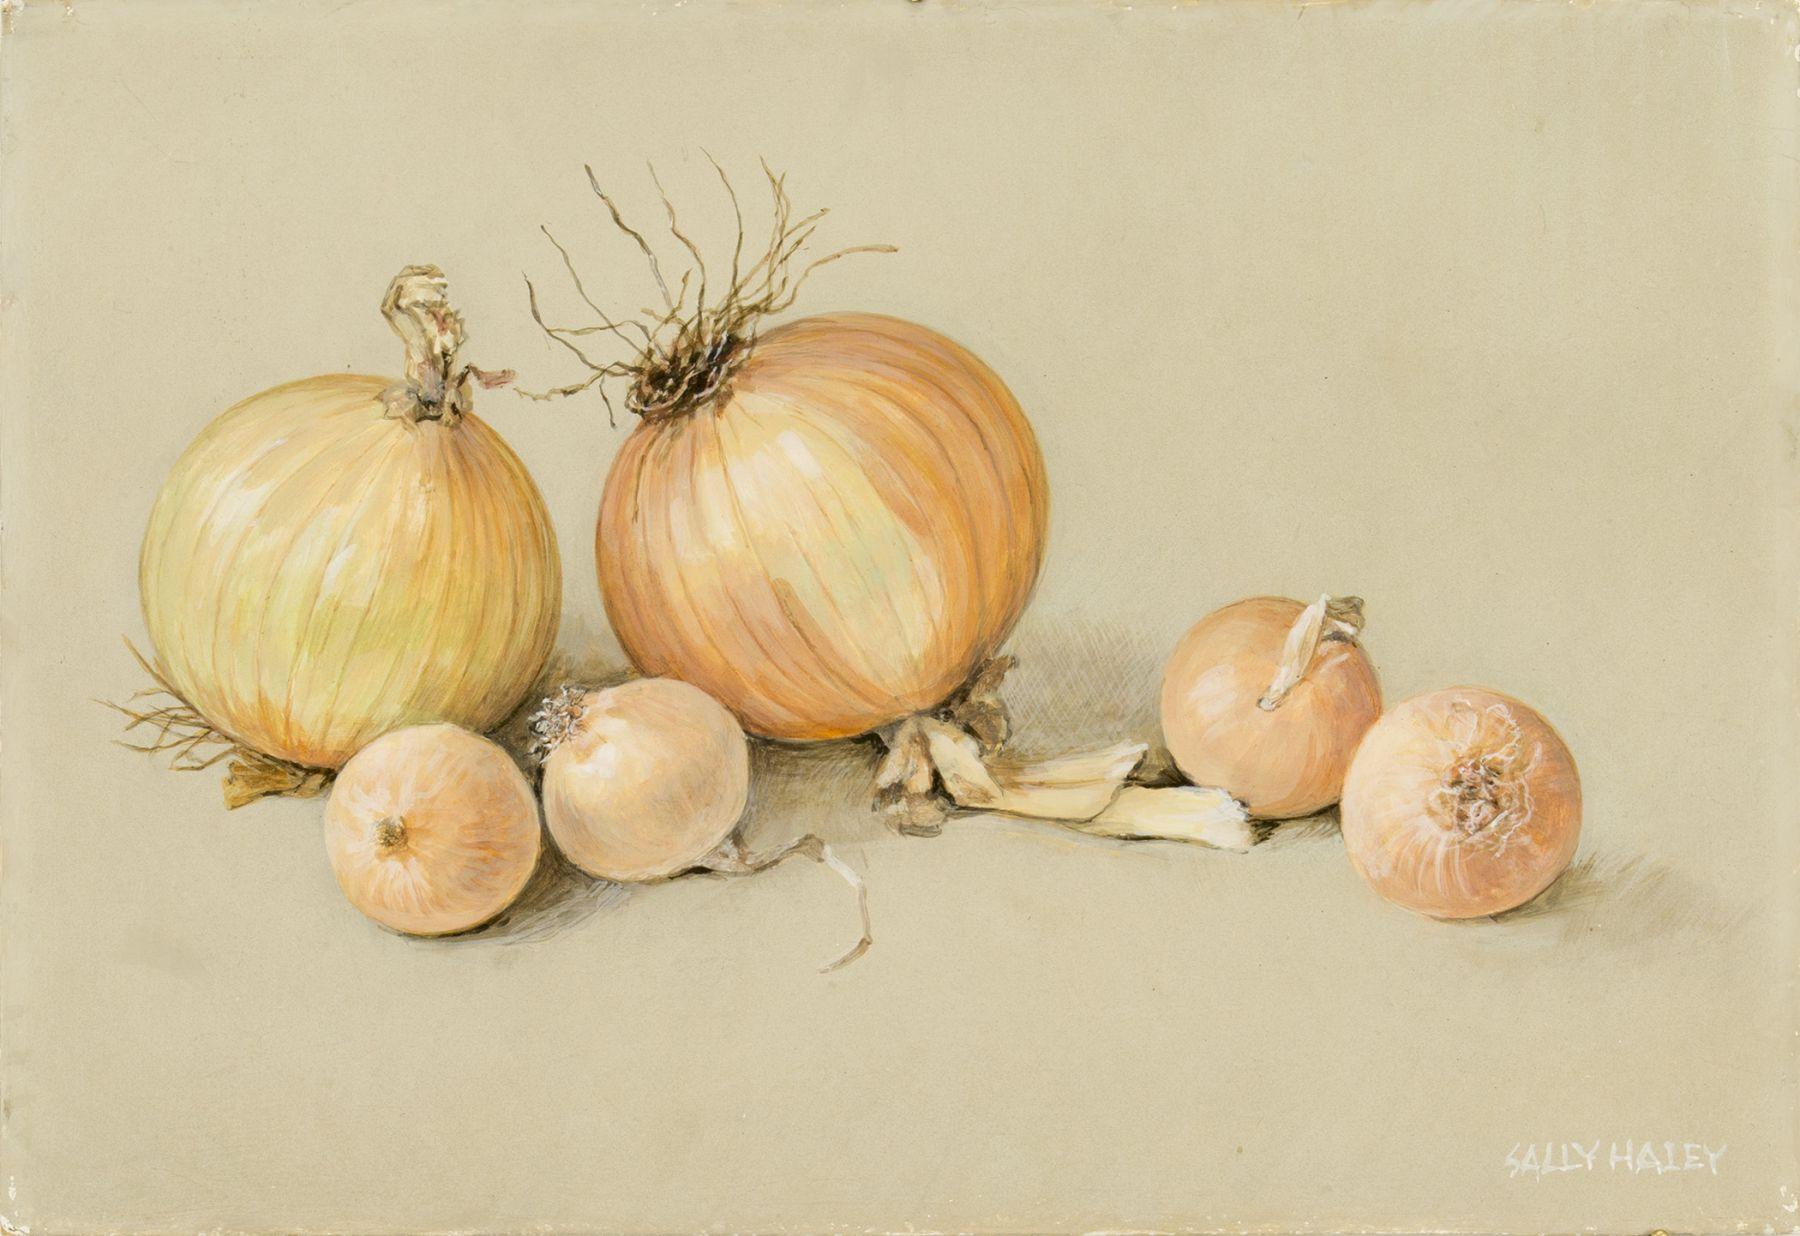 Sally Haley - Six Onions